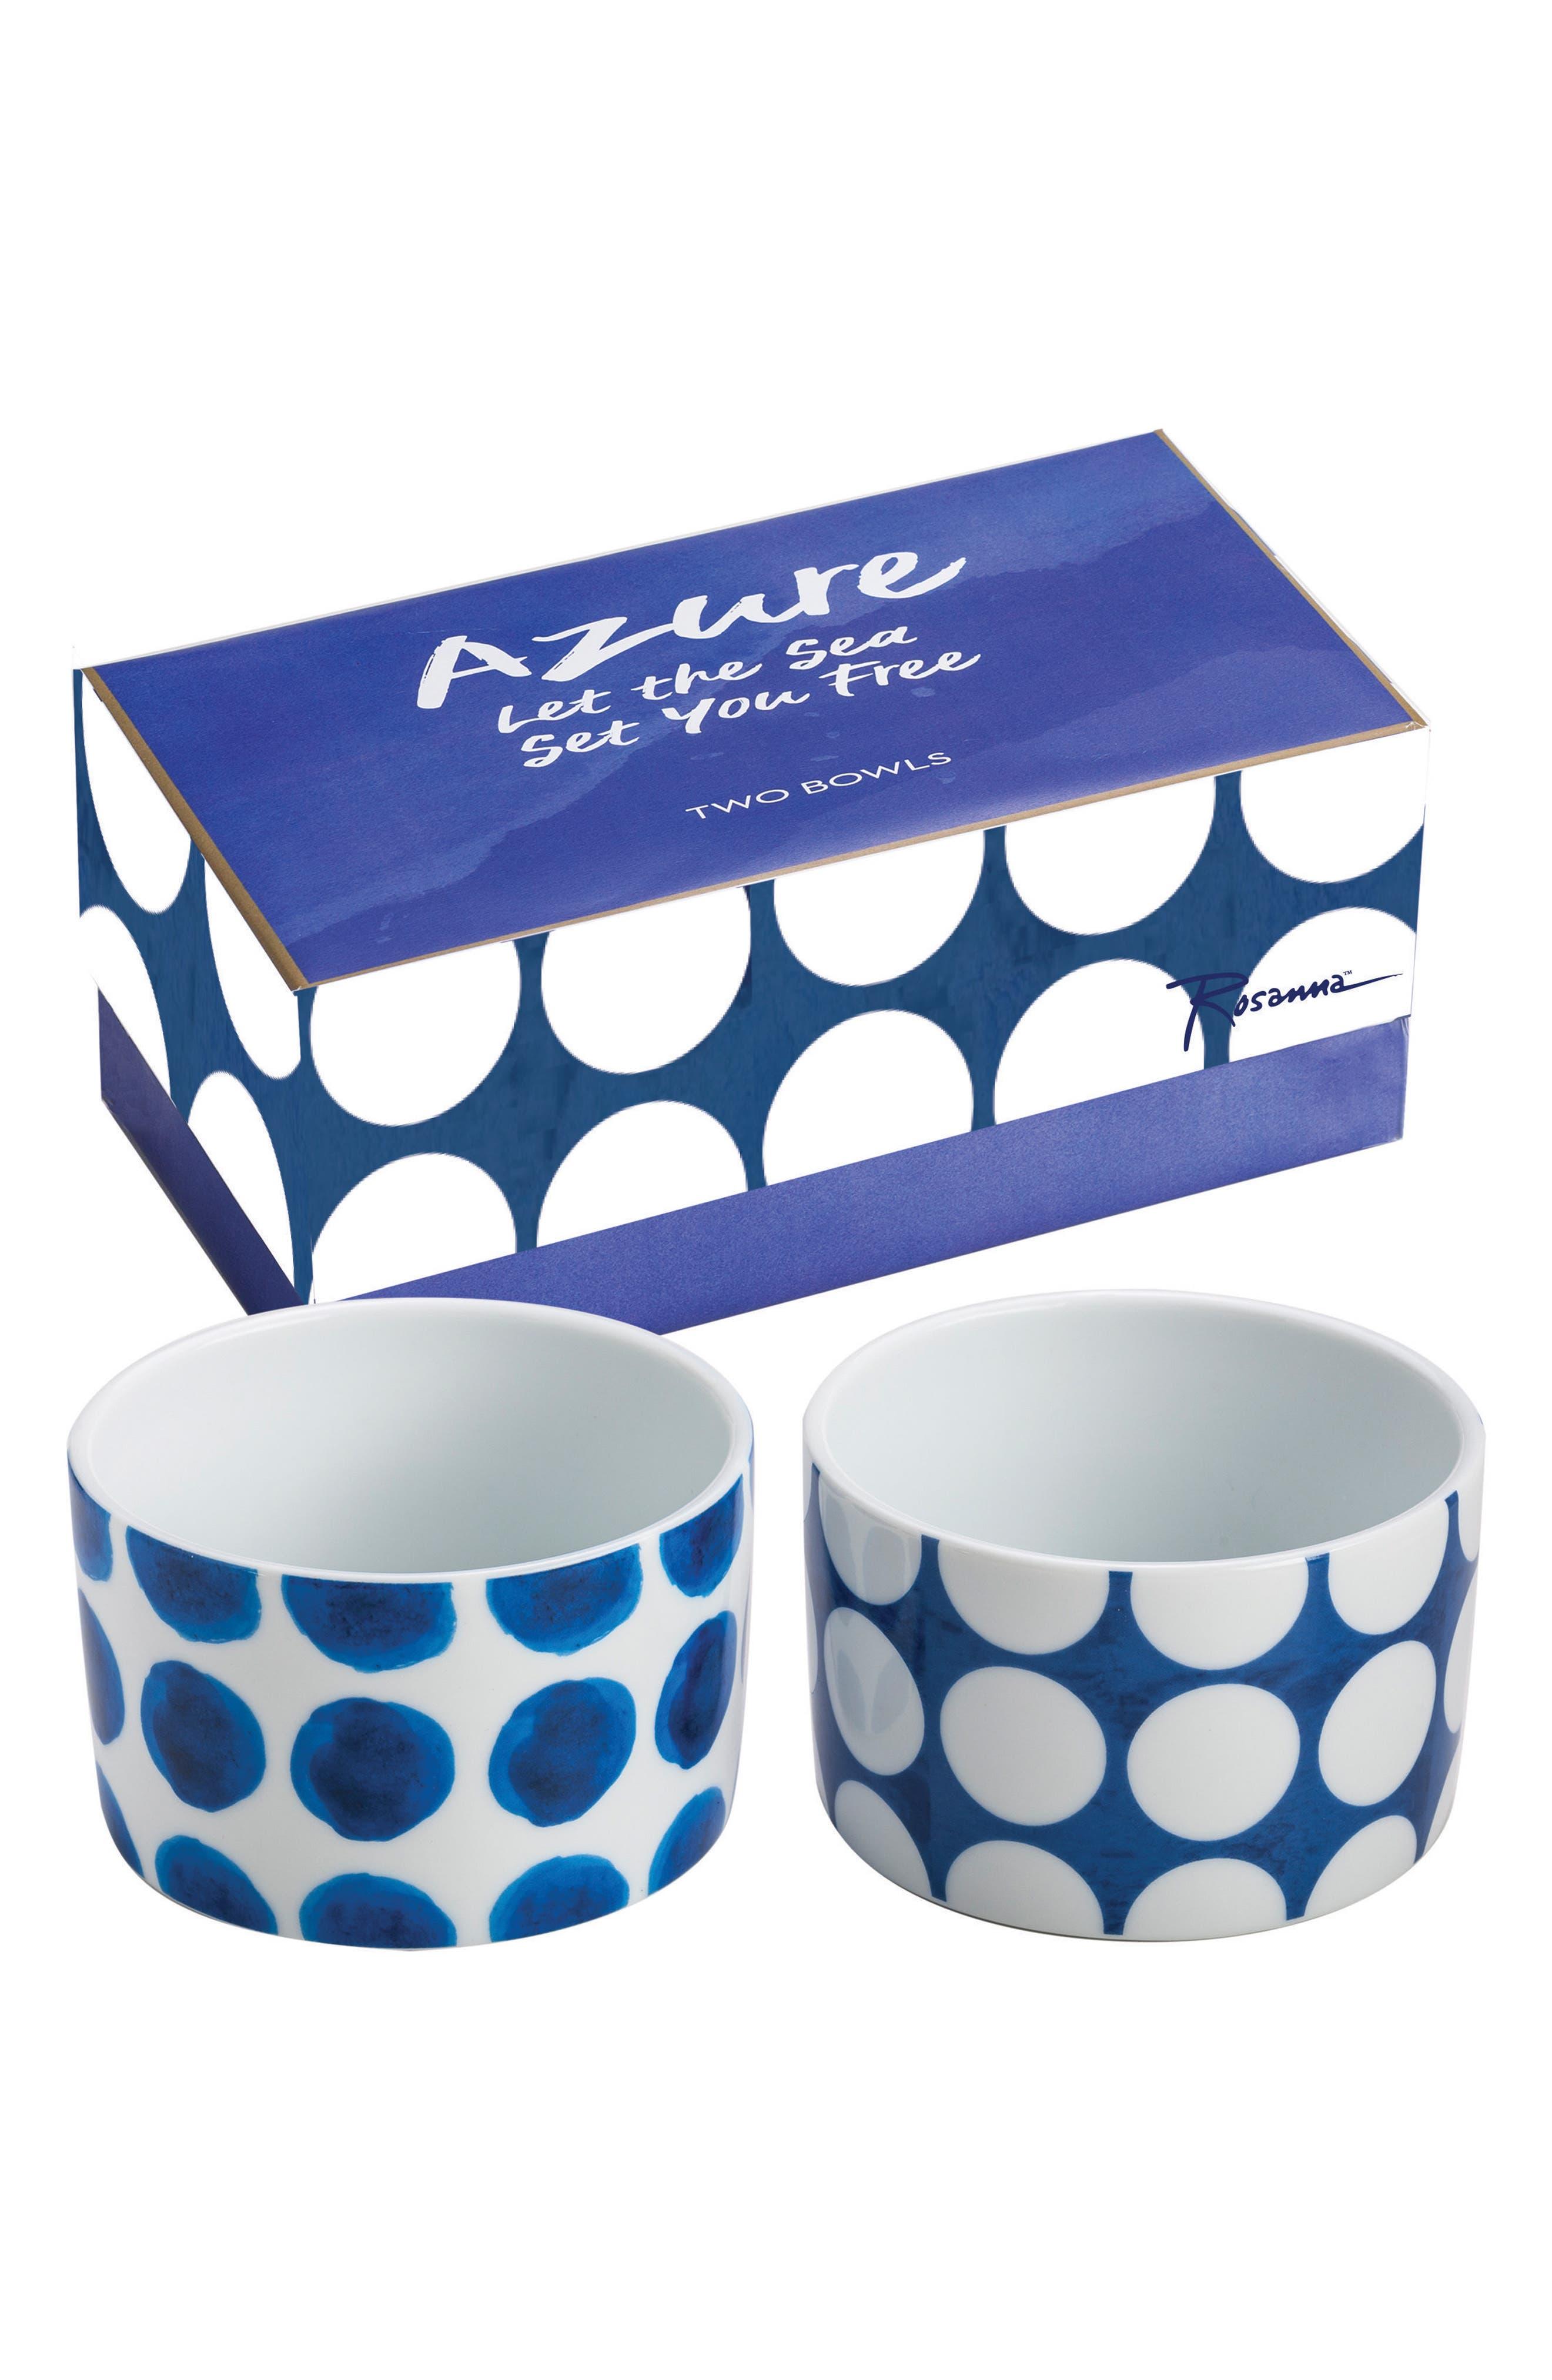 Polka Dot Set of 2 Bowls,                         Main,                         color, Blue/ White